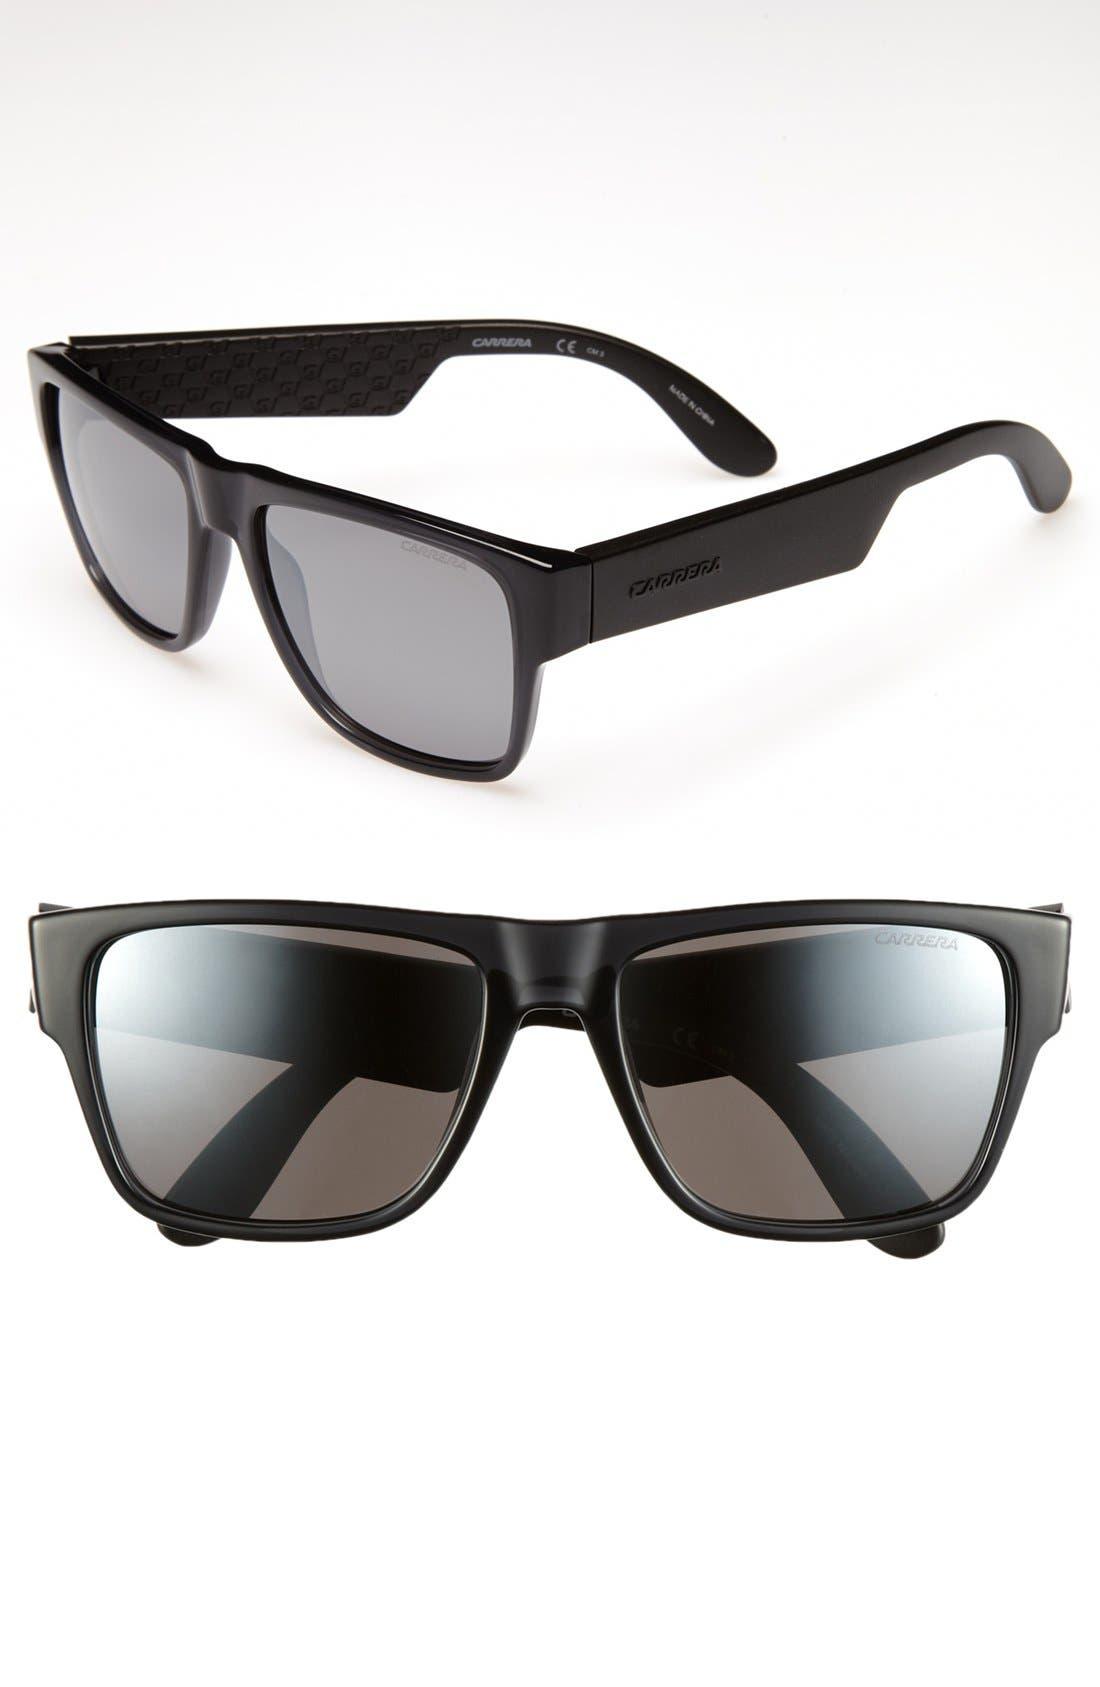 Alternate Image 1 Selected - Carrera Eyewear '5002' 55mm Sunglasses